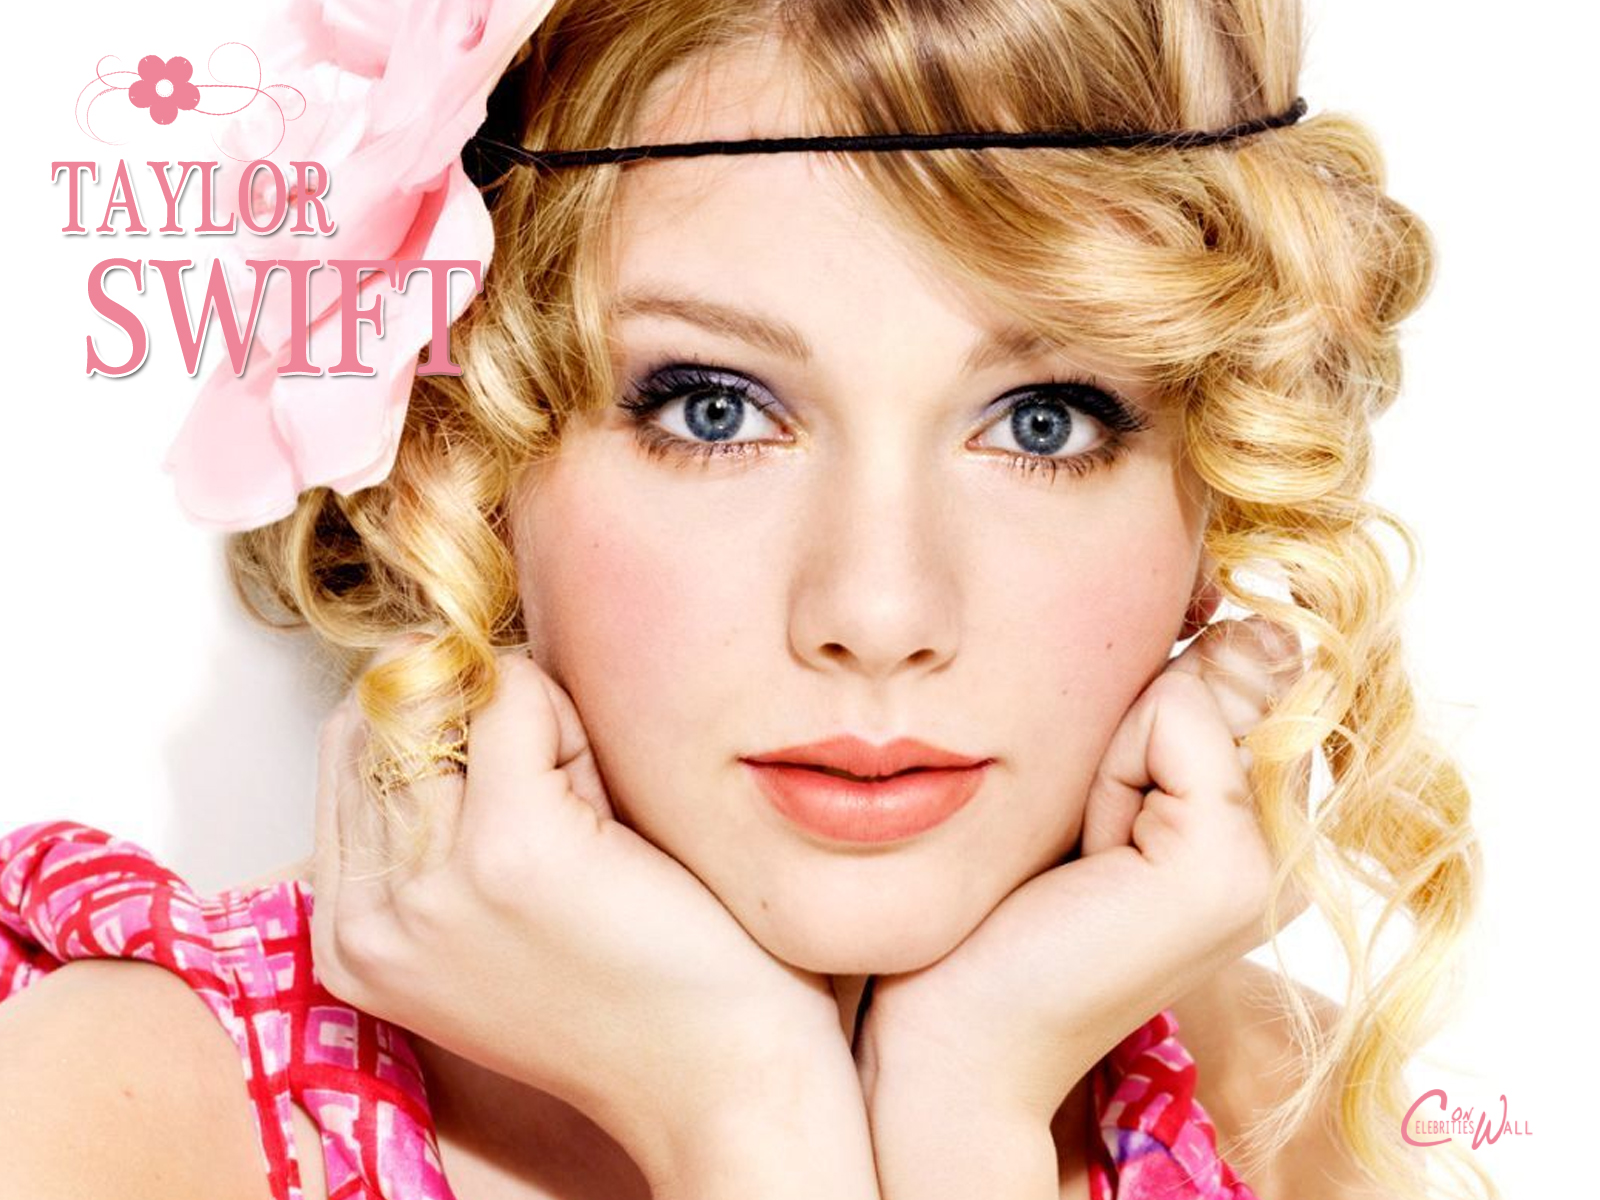 Musik   Taylor Swift Wallpaper 1600x1200